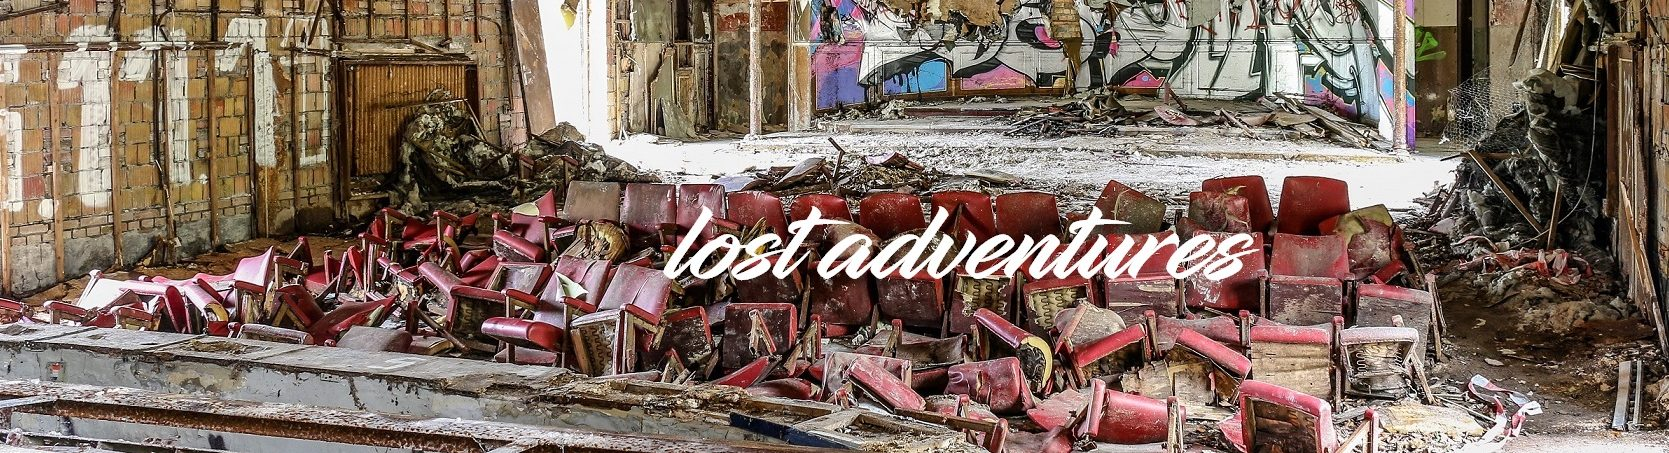 lost adventures